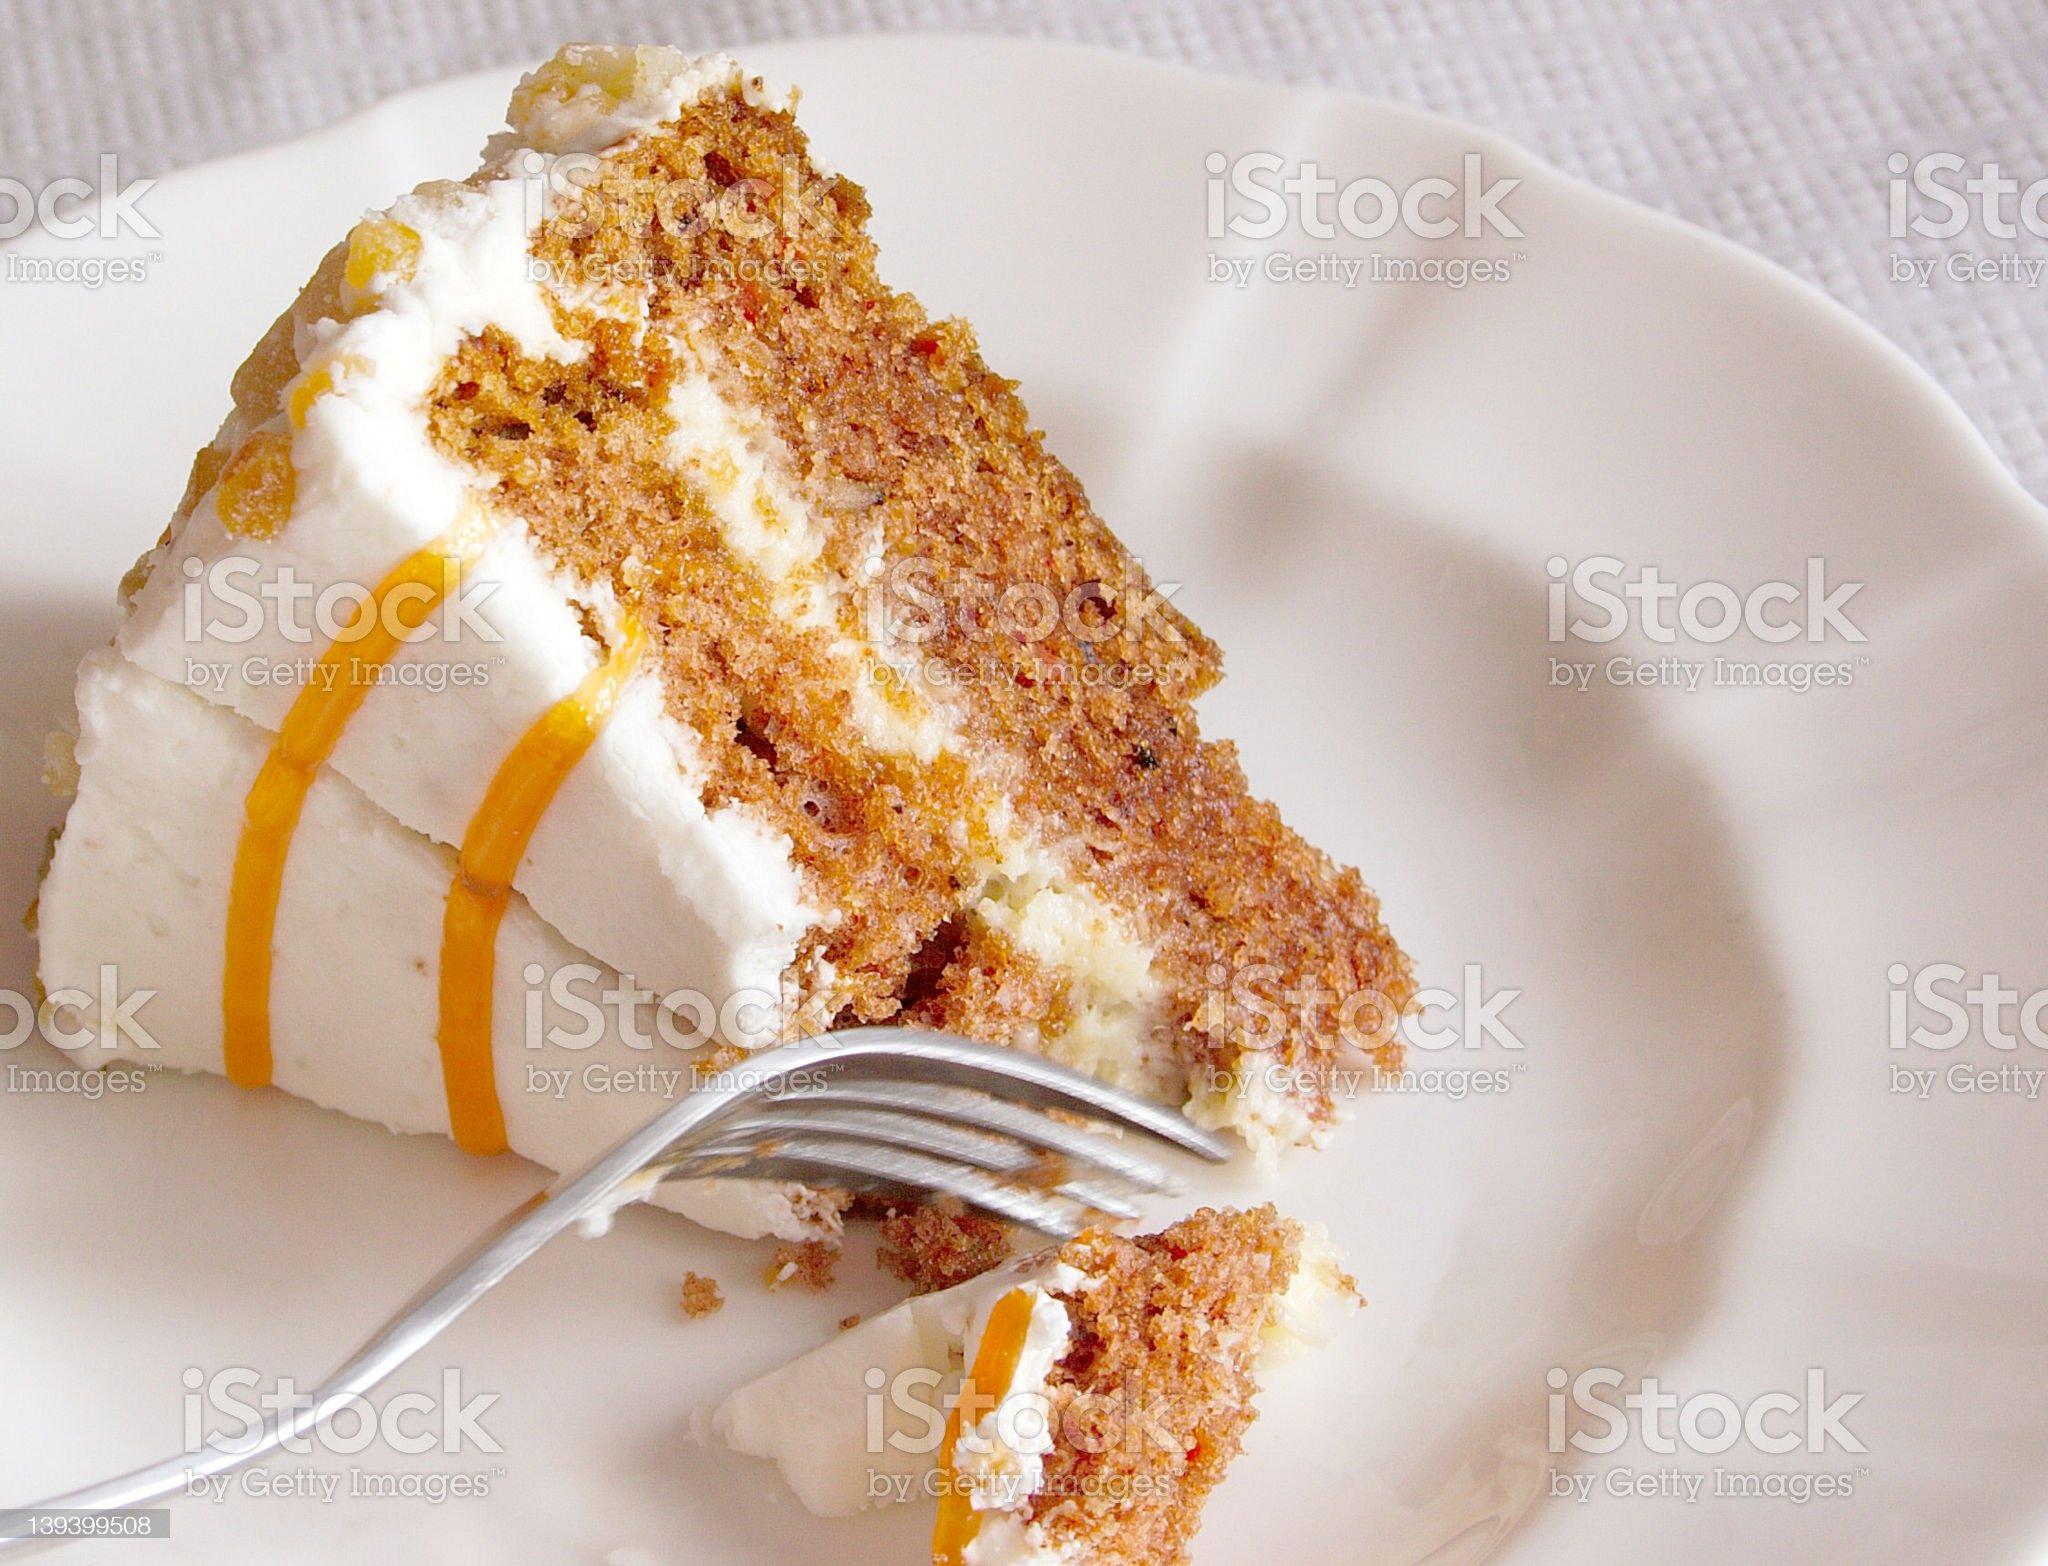 cutting cake royalty-free stock photo